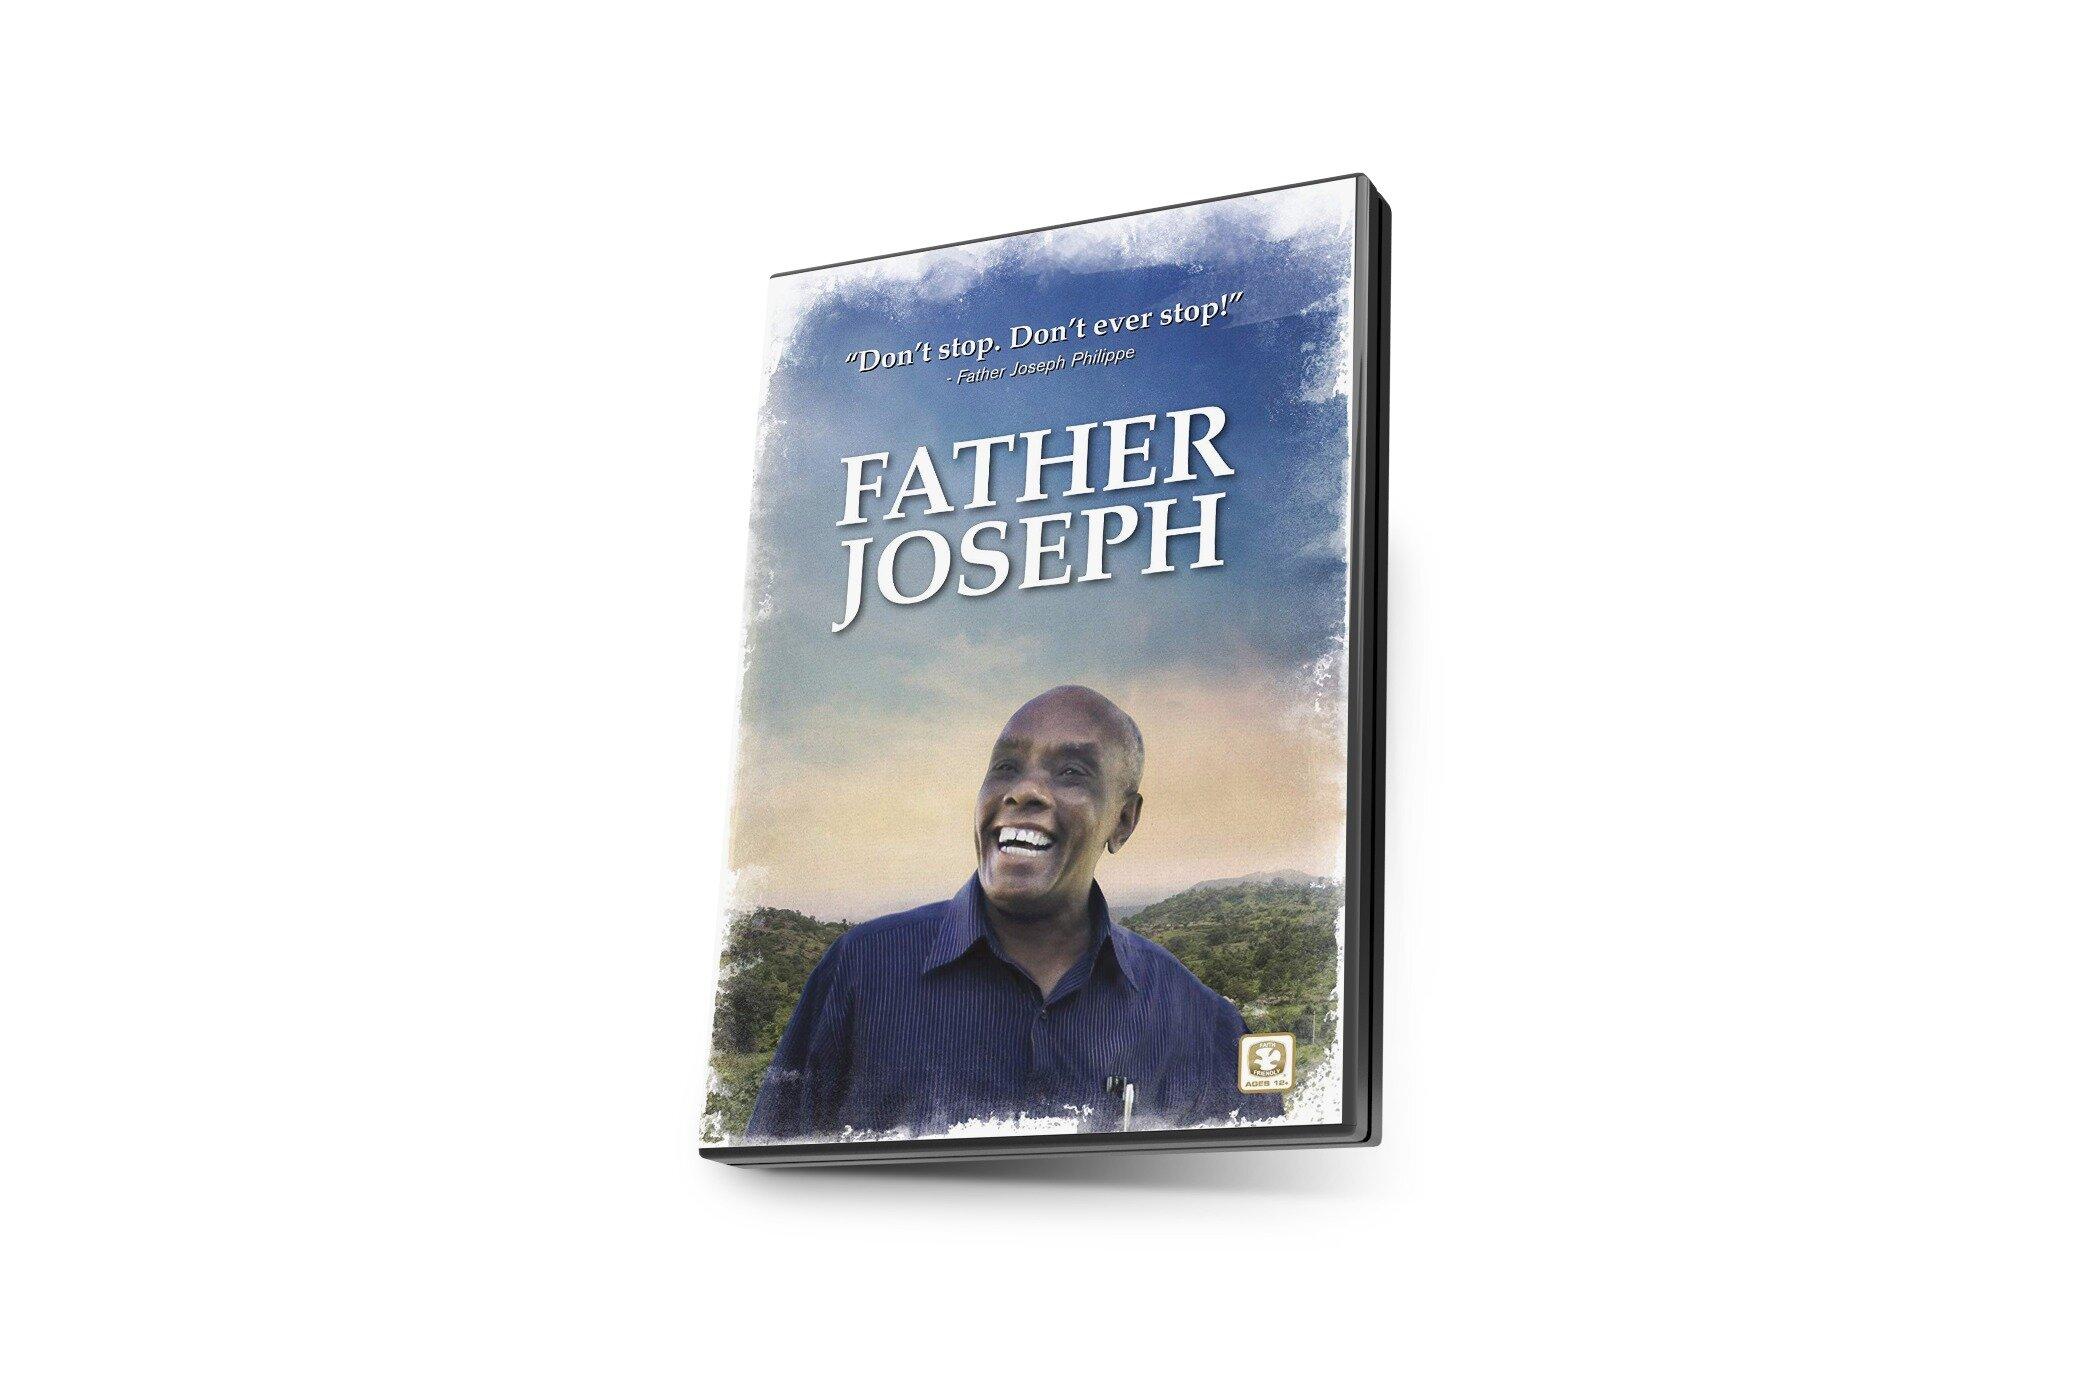 father joseph dvd.jpeg